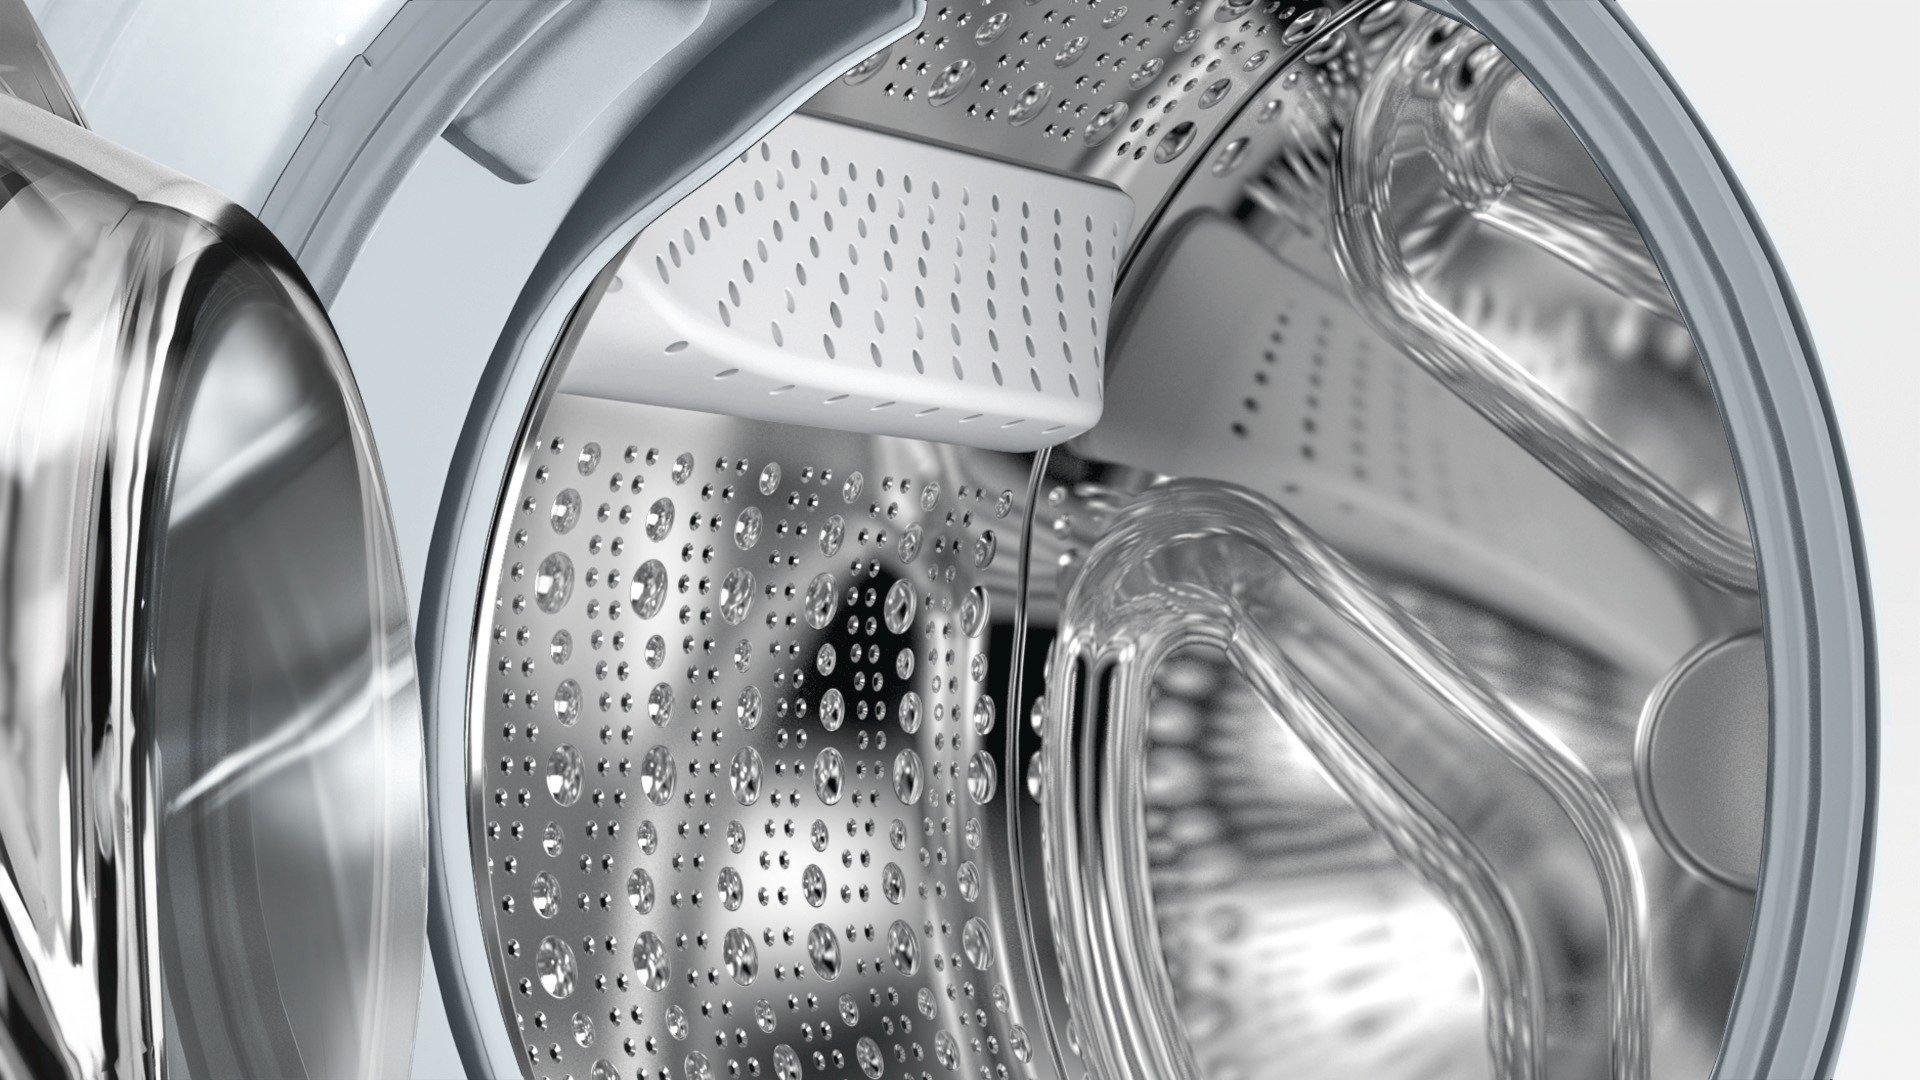 Siemens-wm14-W59-a-autonome-Belastung-Bevor-8-kg-1381trmin-A-Wei-Waschmaschine–Waschmaschinen-autonome-bevor-Belastung-wei-links-wei-8-kg